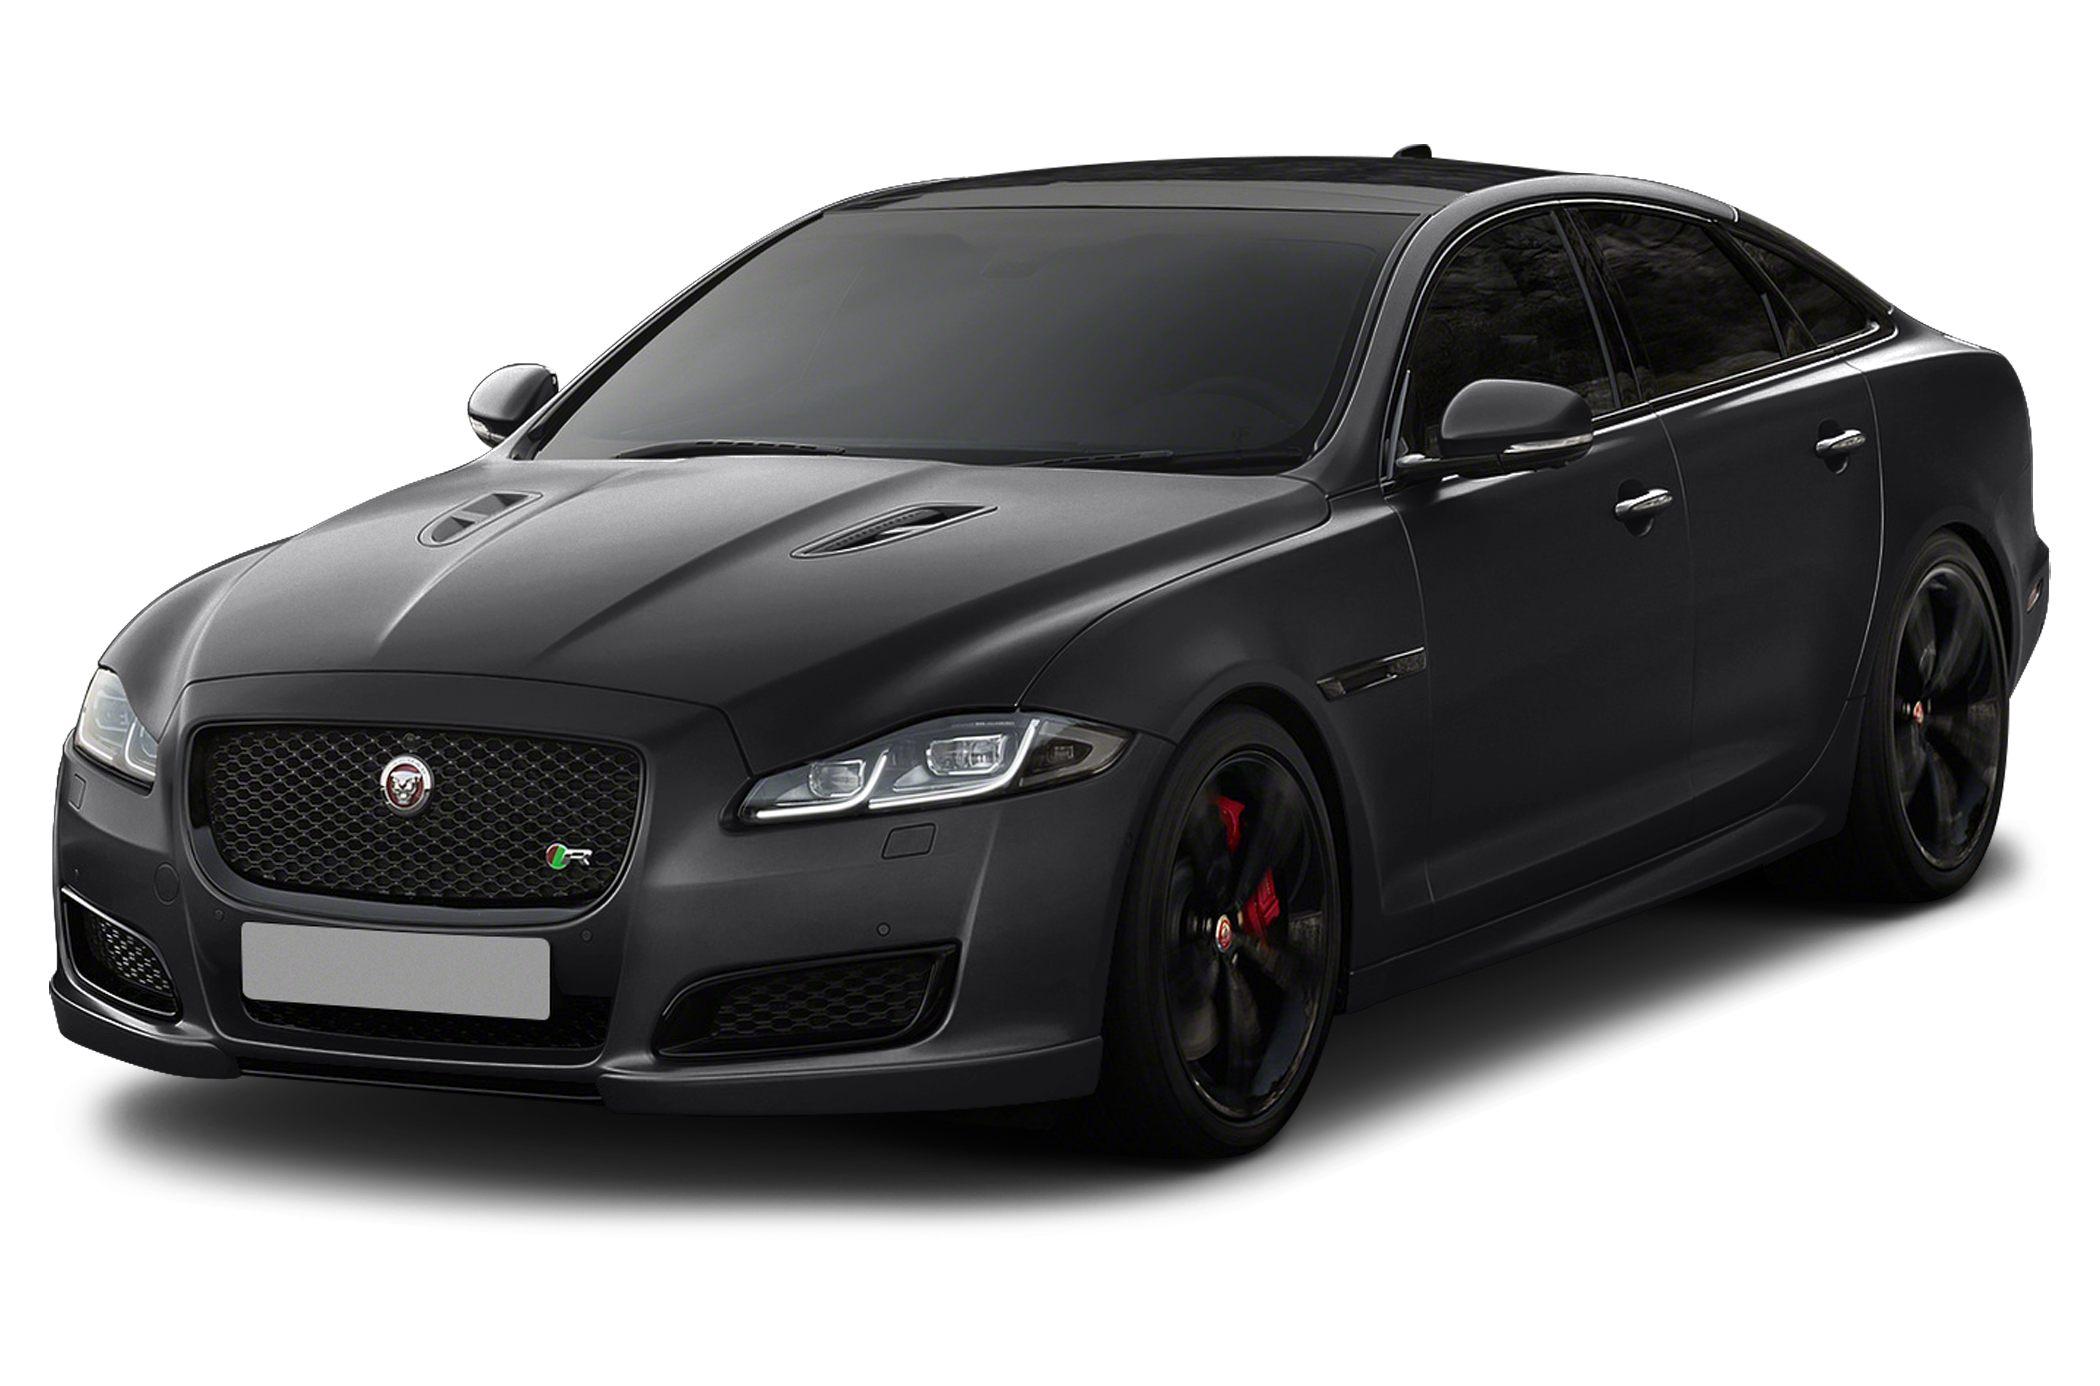 2019 Jaguar Xj Xjr575 4dr Rear Wheel Drive Sedan Pricing And Options